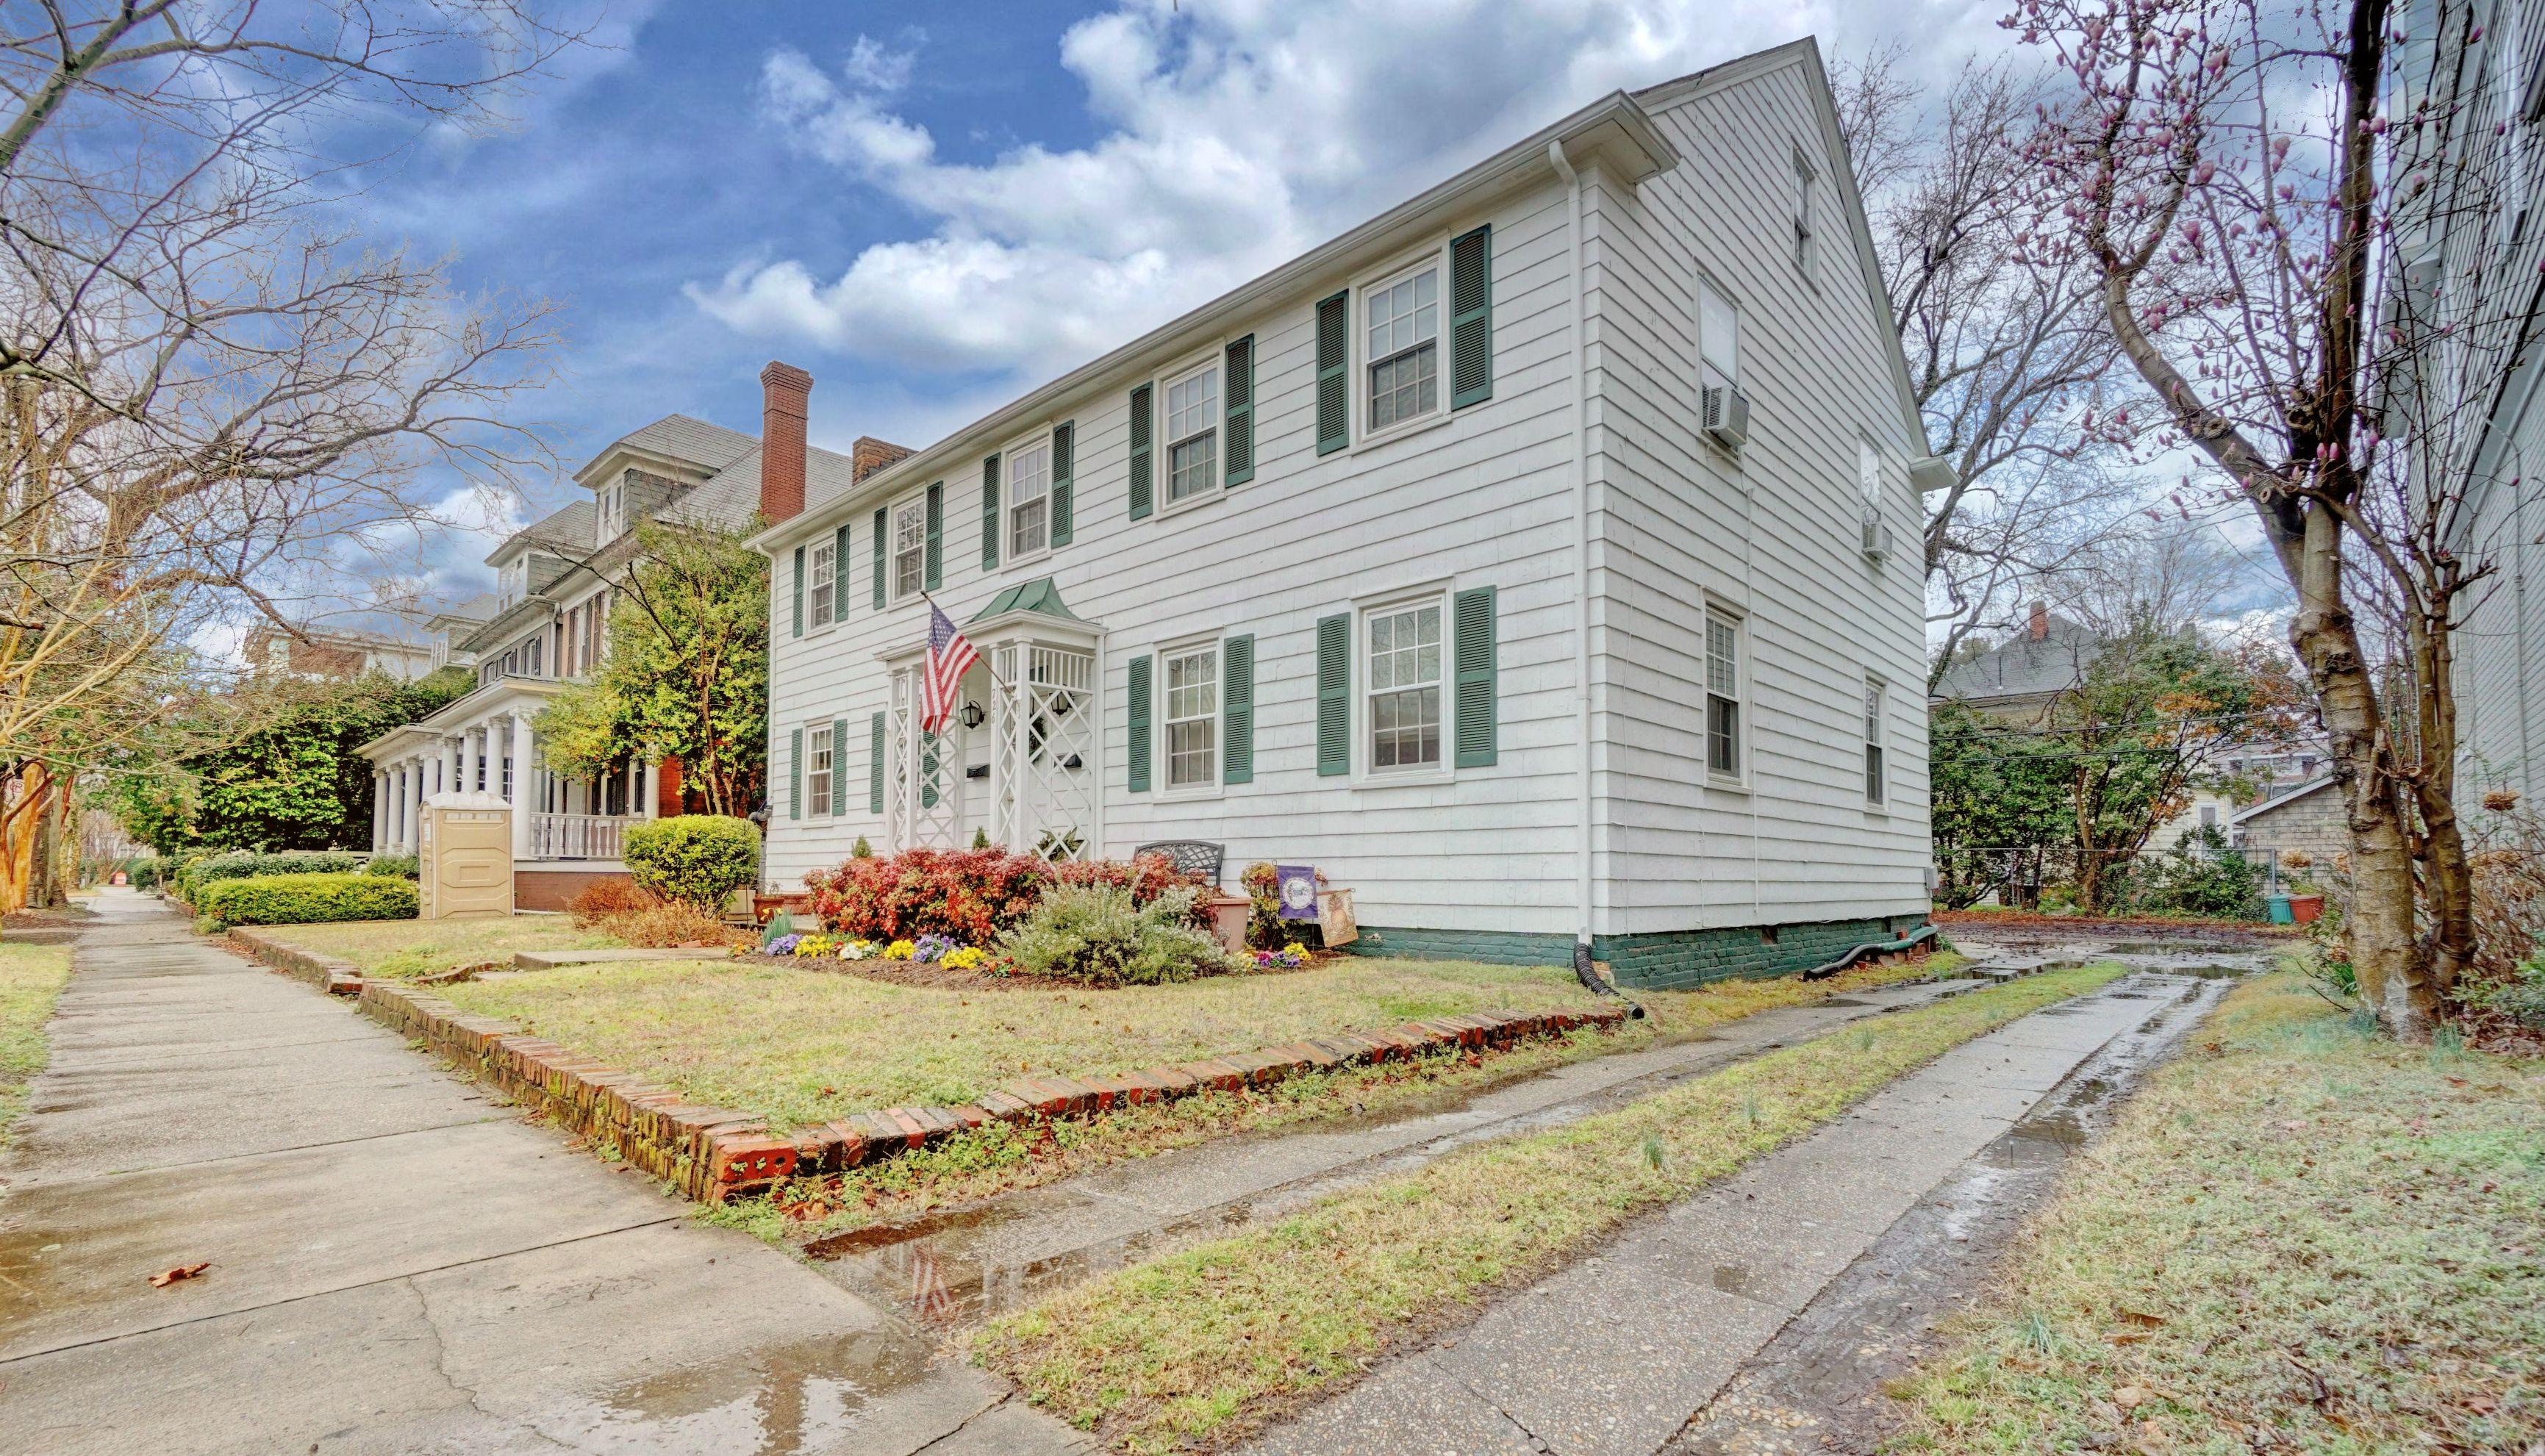 726 Graydon Ave: Sold!